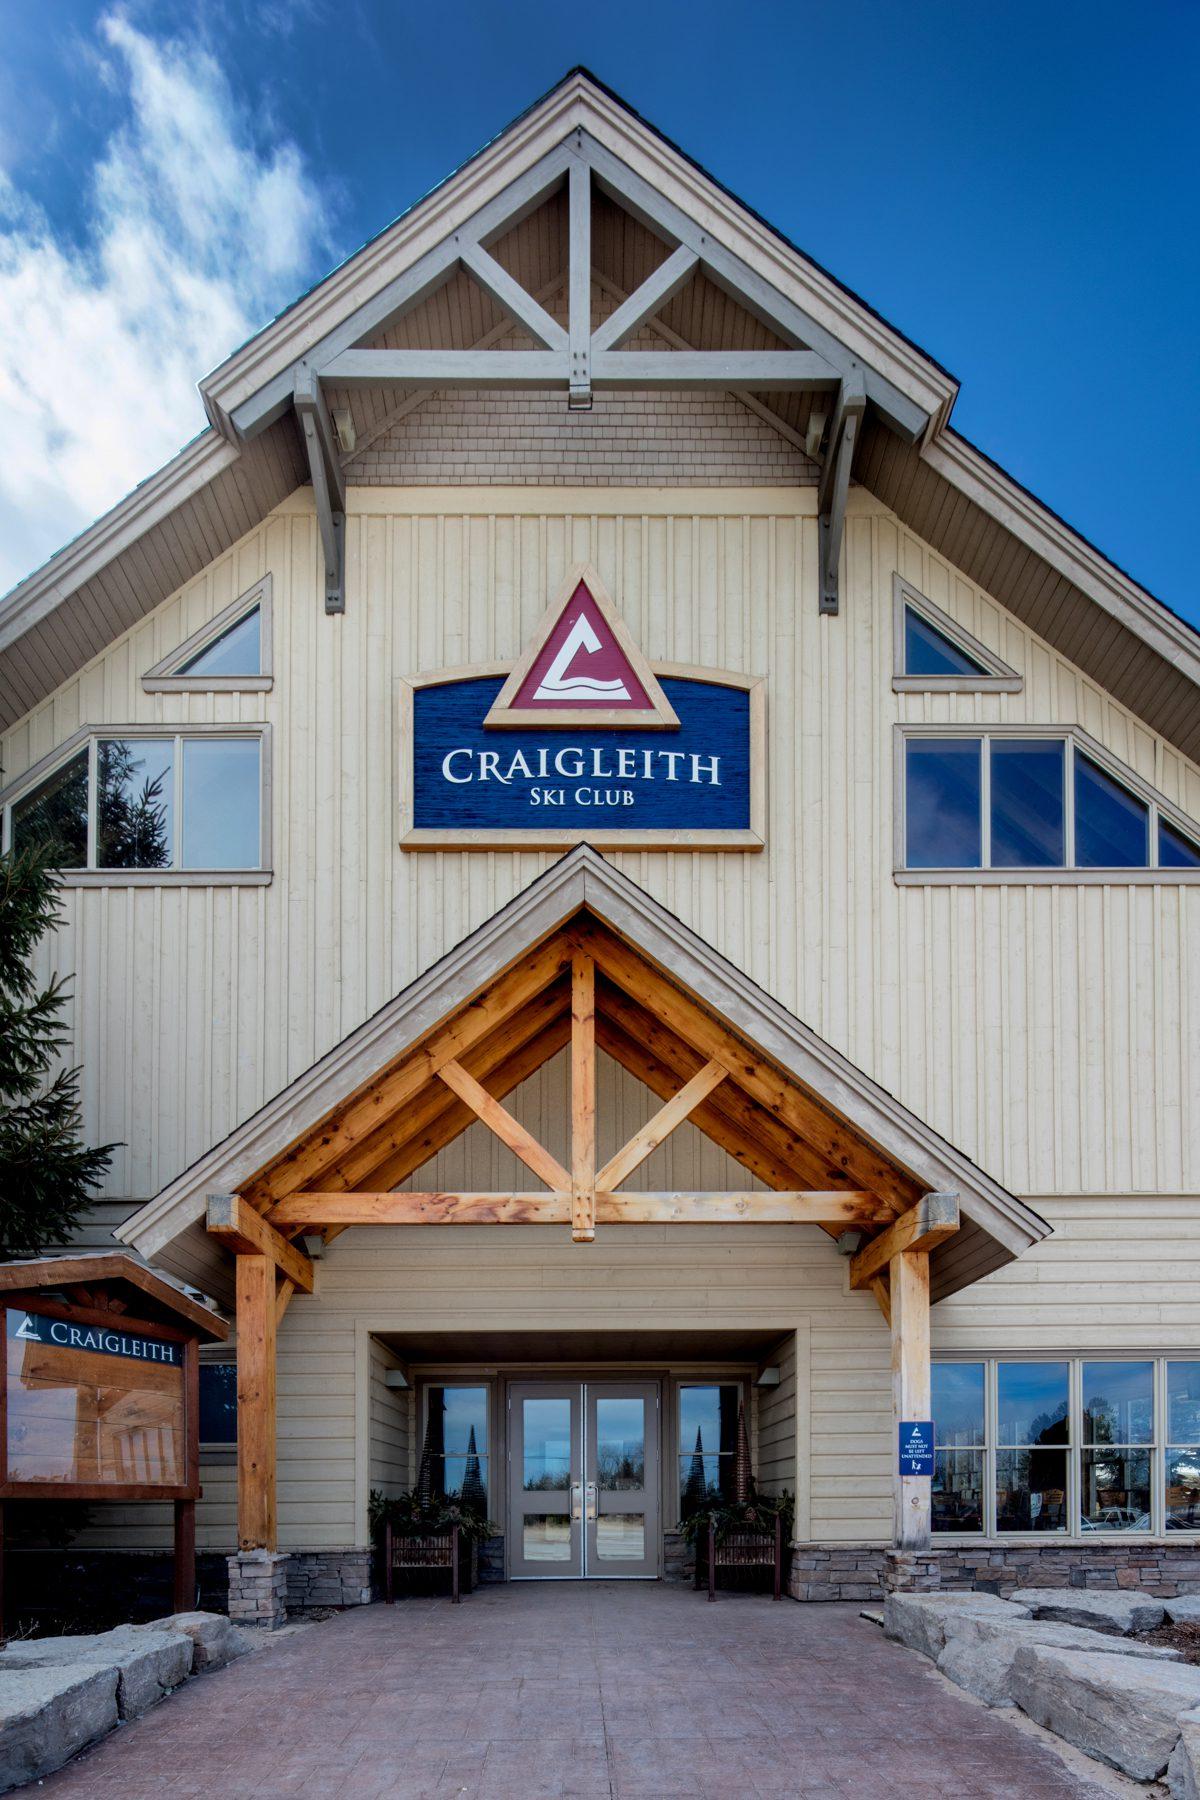 Normerica Timber Frame, Commercial Project, Craigleith Ski Club, Ski Resort, Collingwood, Ontario, Exterior, Entrance